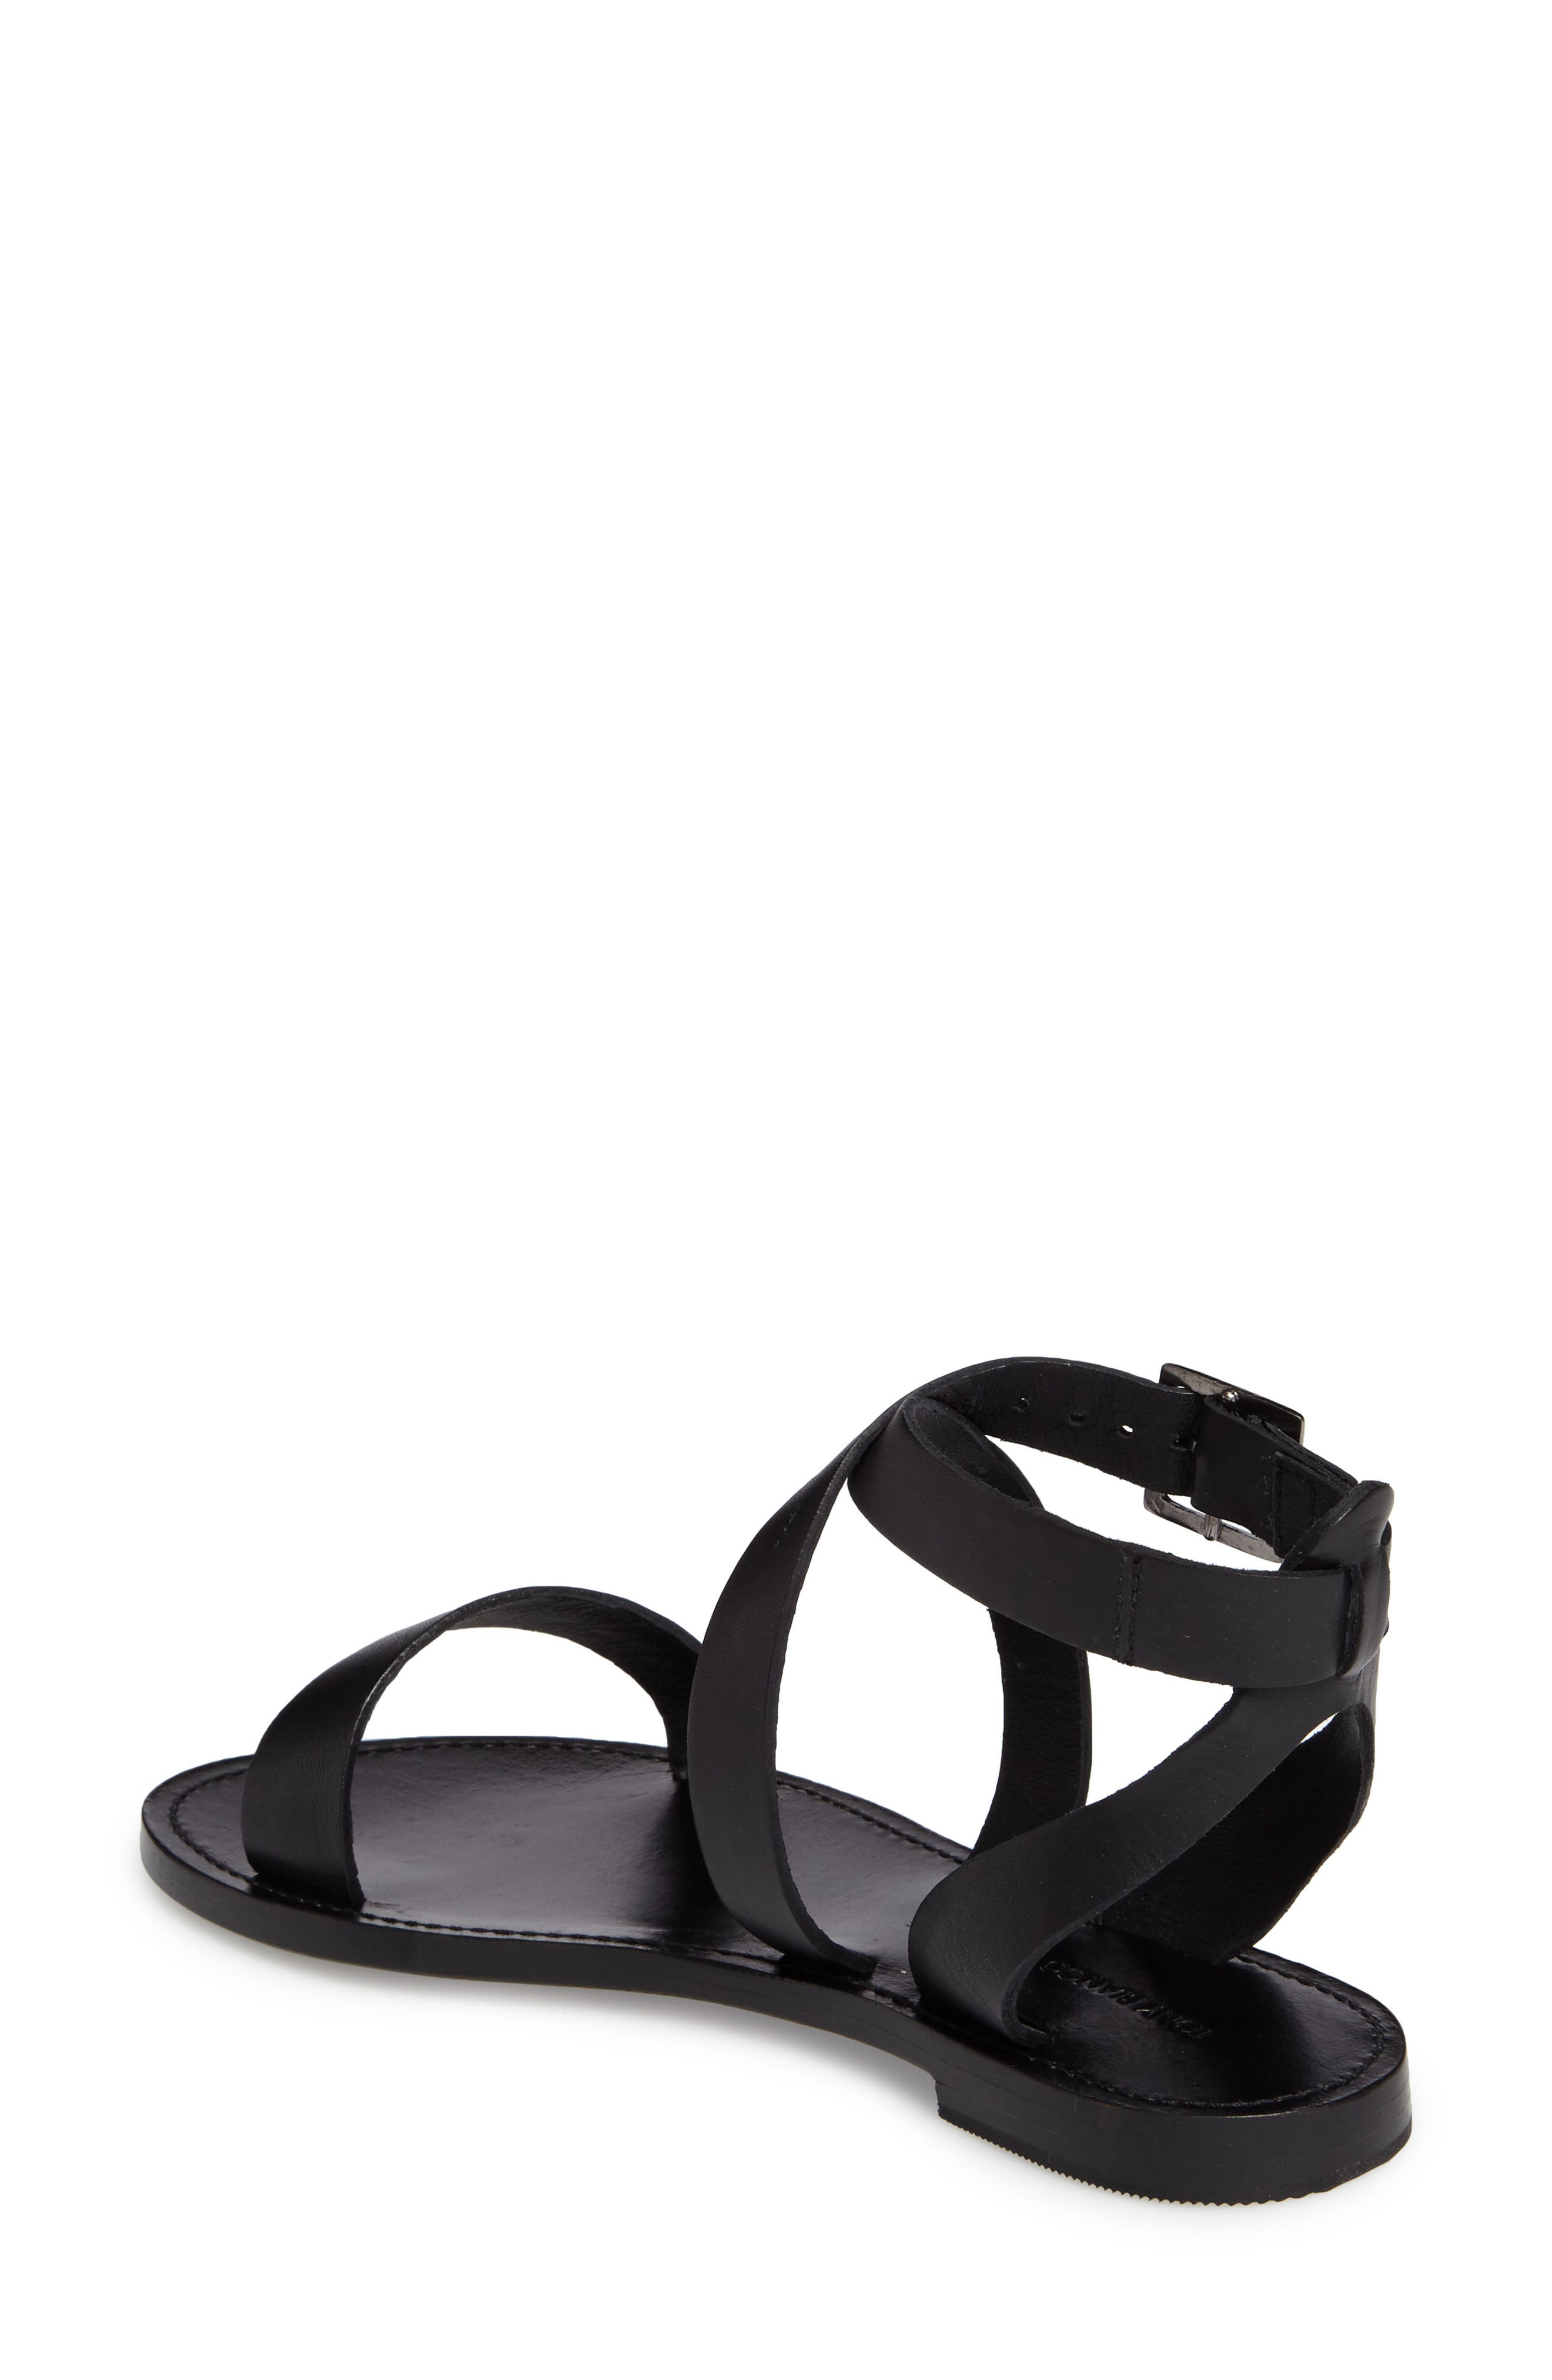 Flo Ankle Strap Sandal,                             Alternate thumbnail 2, color,                             001